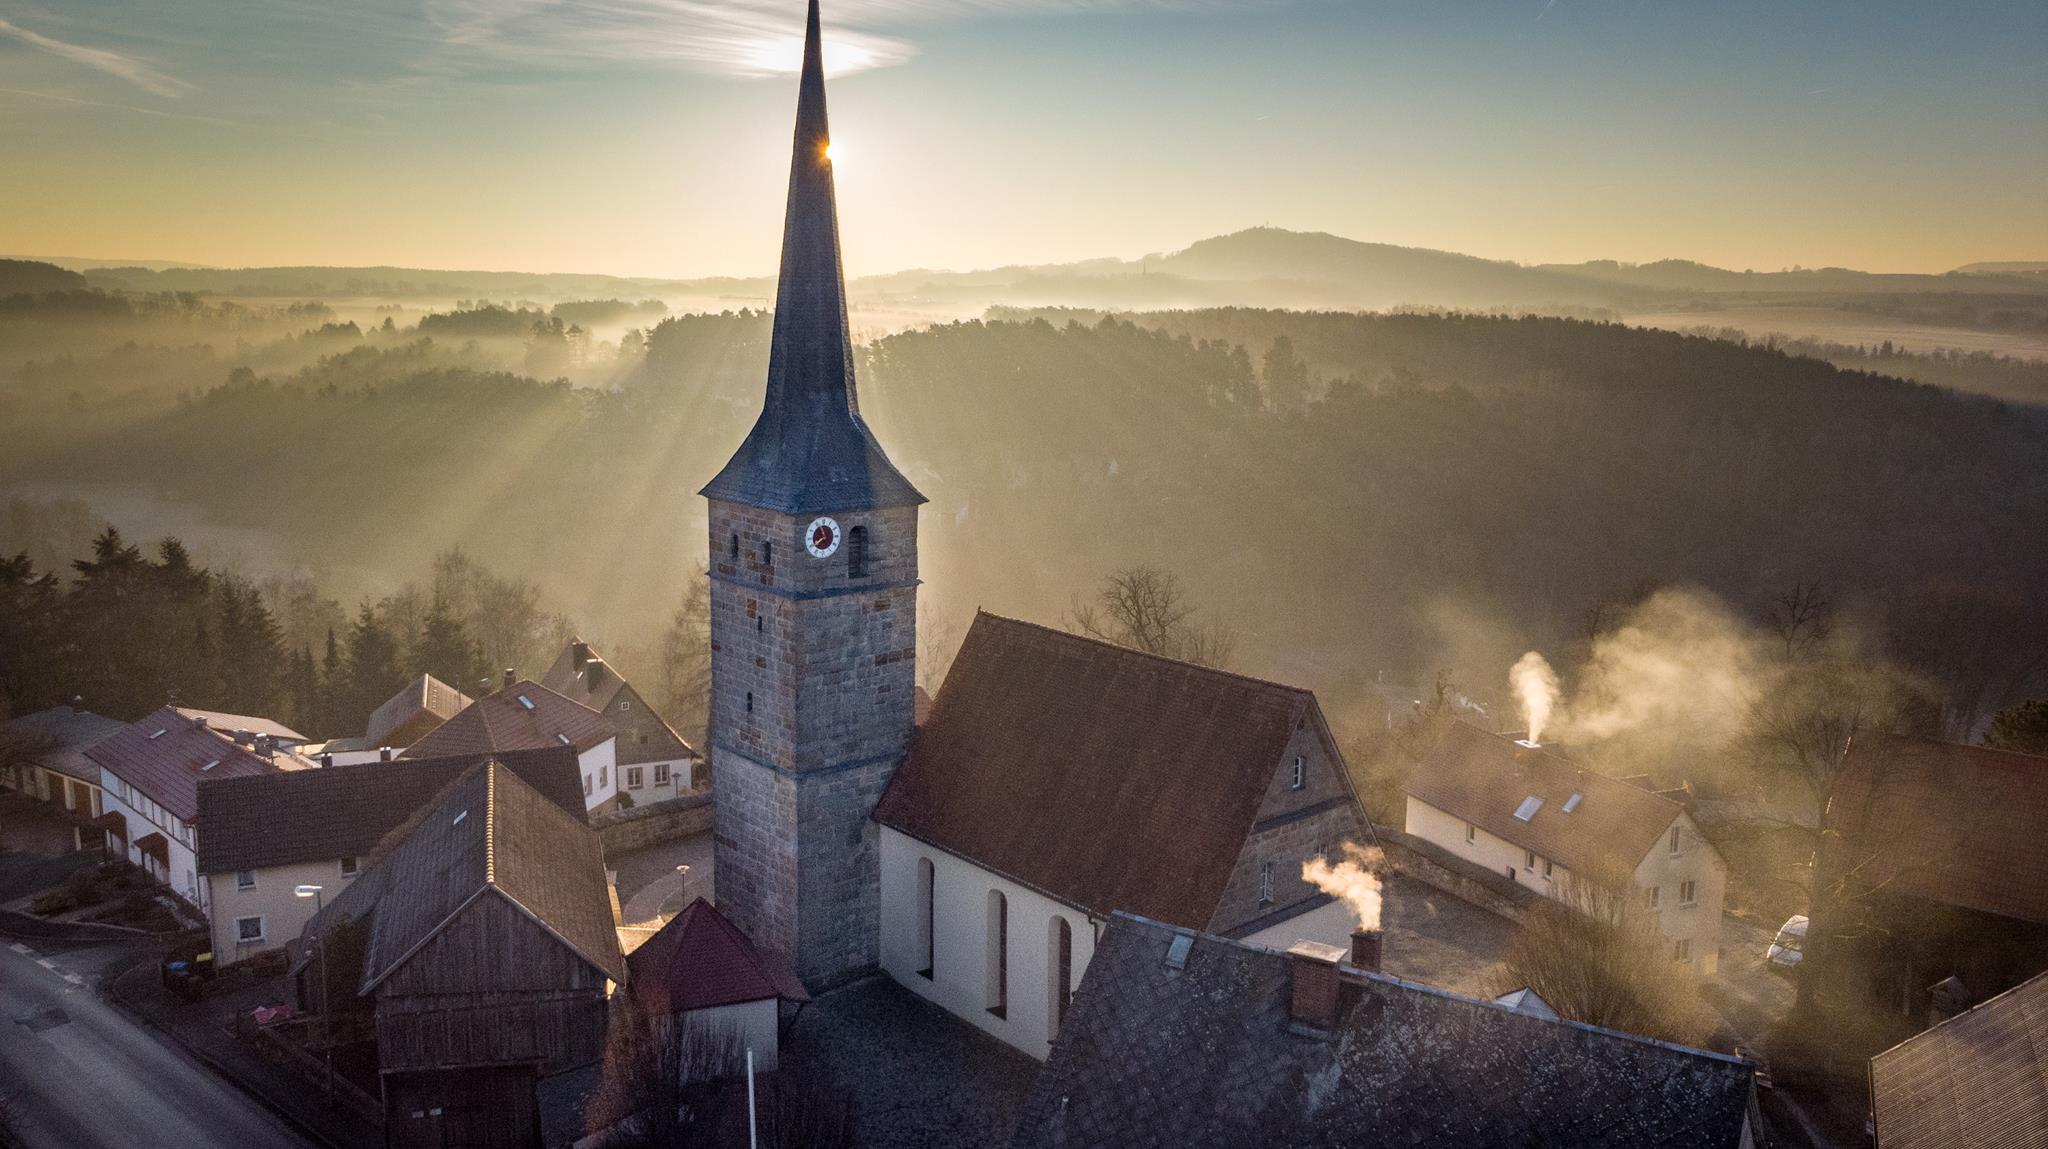 Mistelbach St. Bartholomäus Luftaufnahme